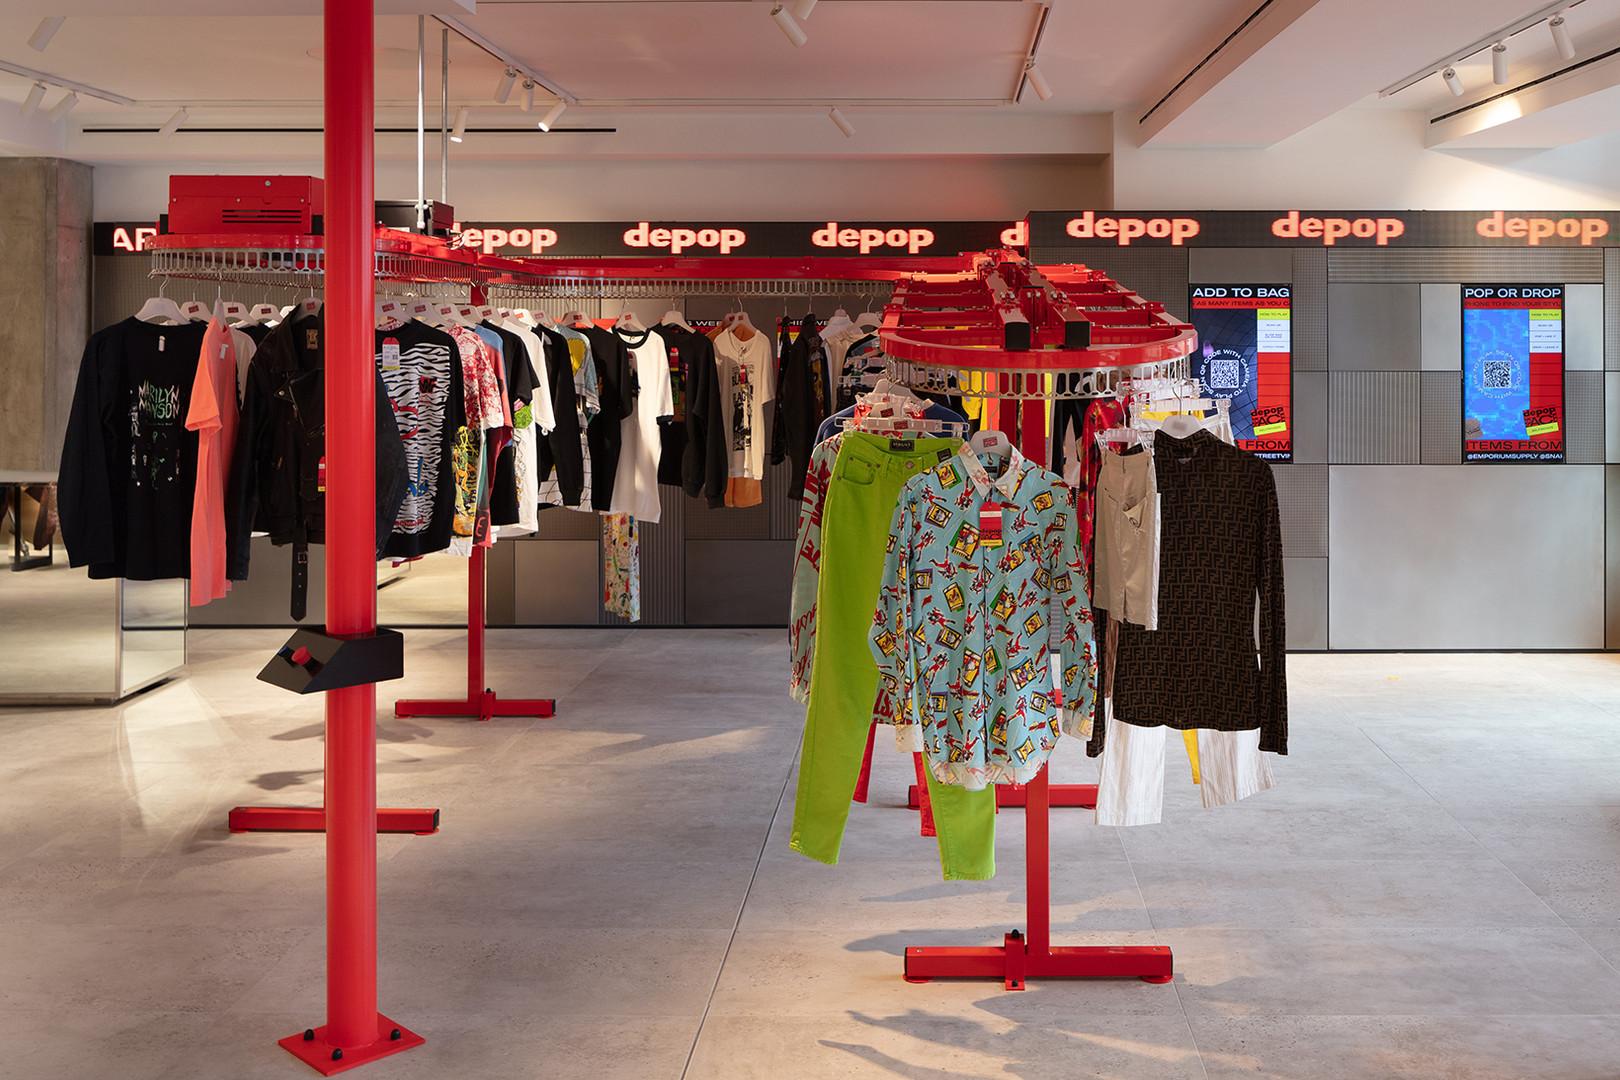 depop-resale-shopping-app-london-selfrid